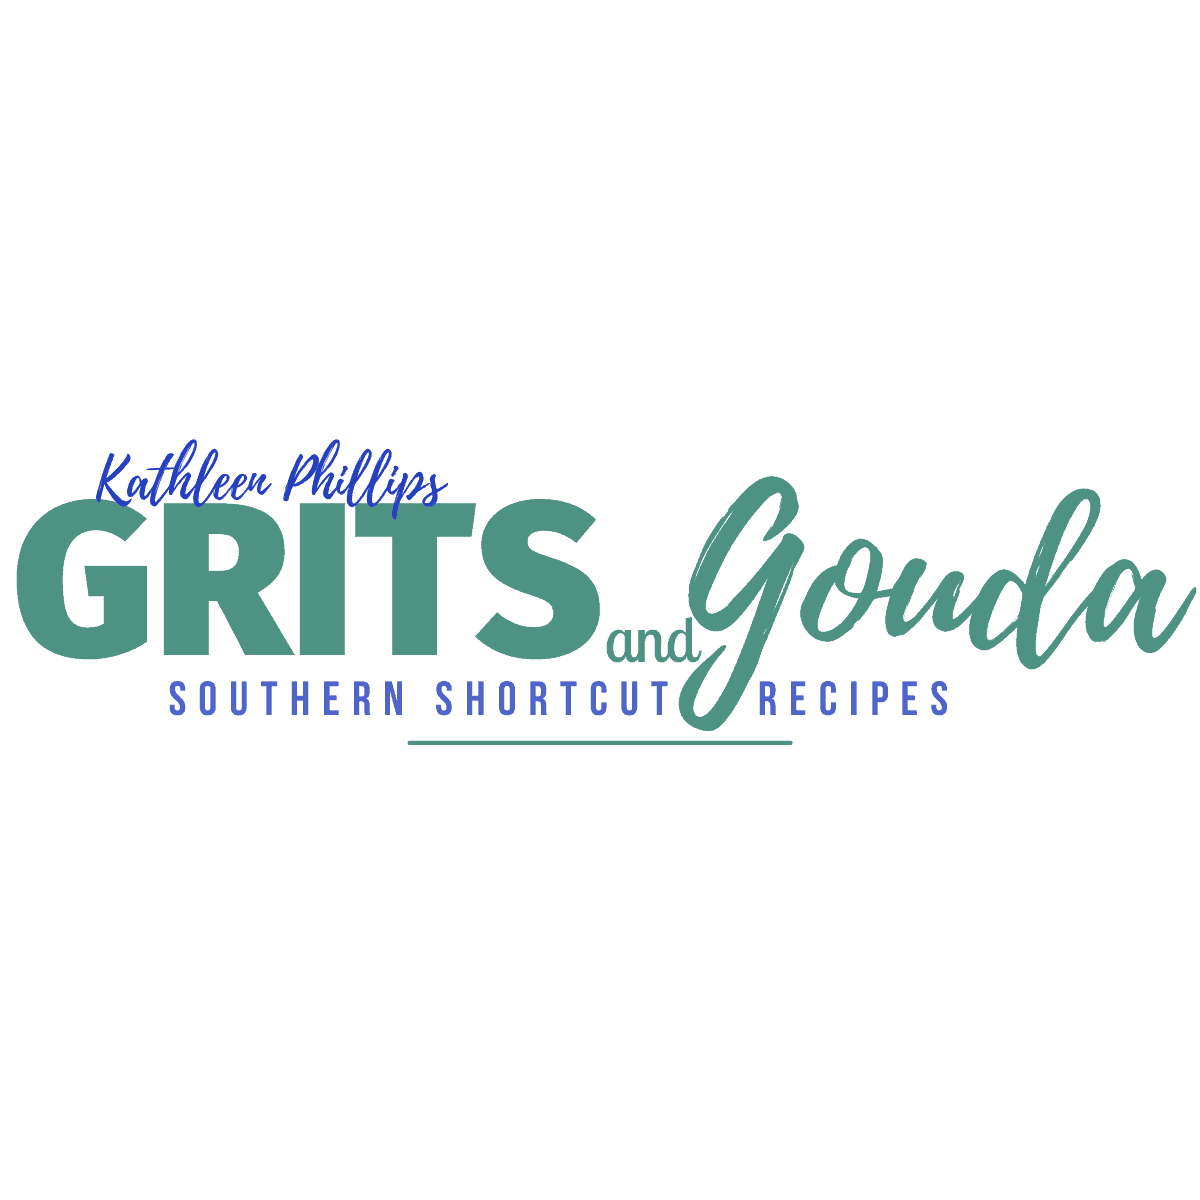 Grits and Gouda blog logo